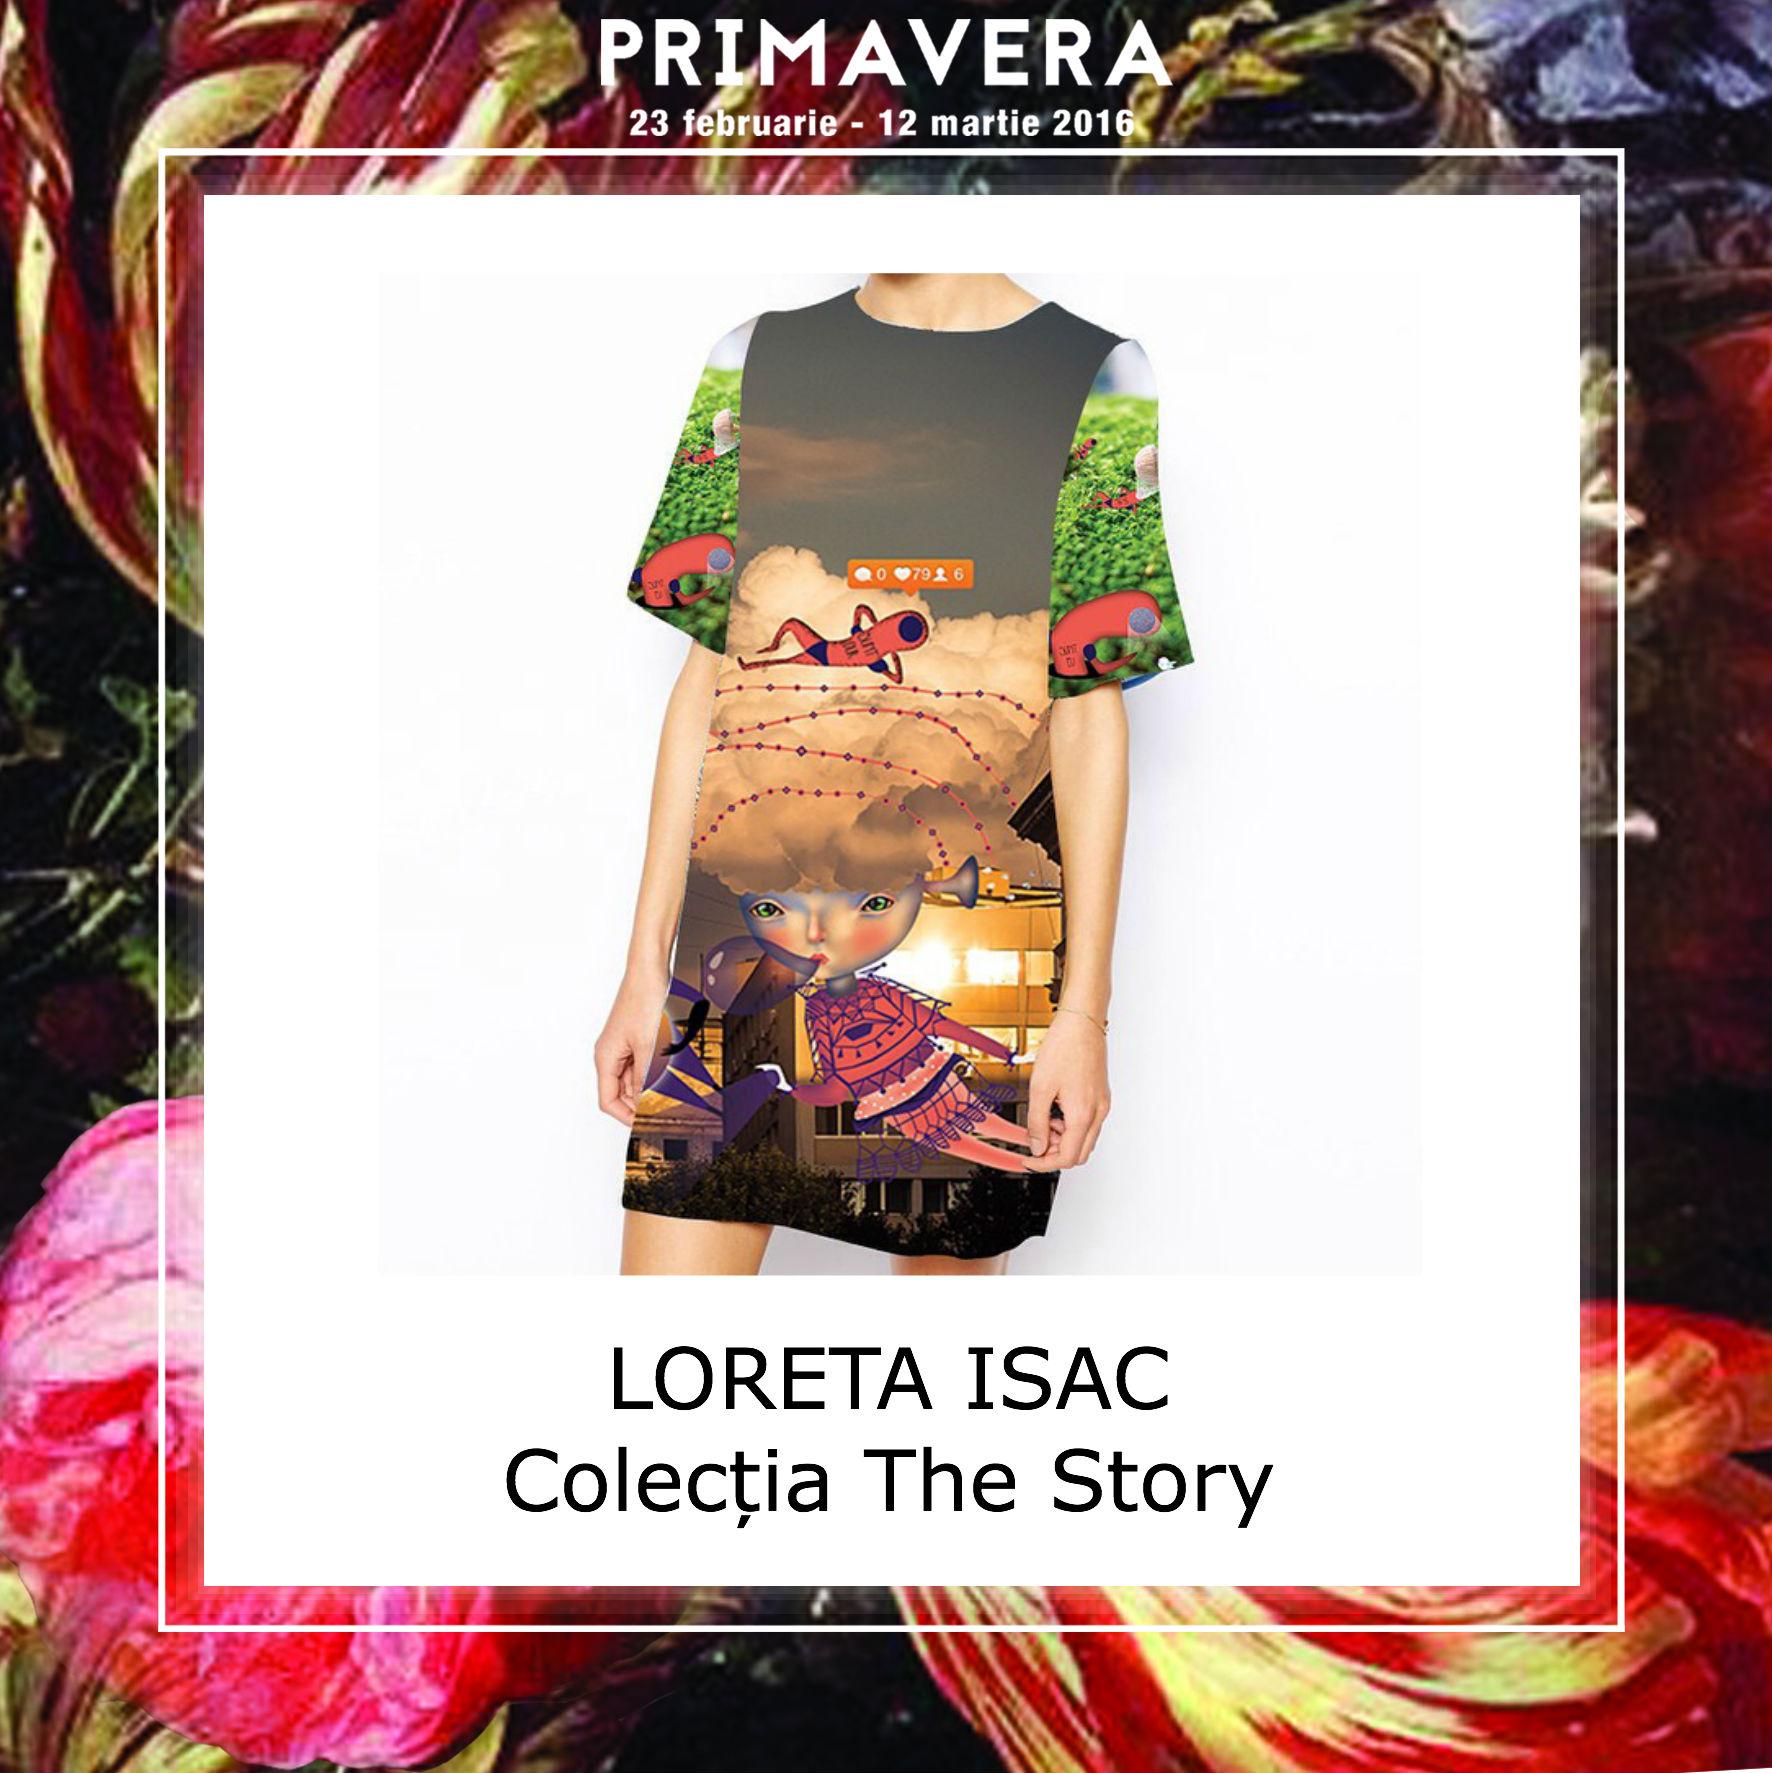 loreta isac